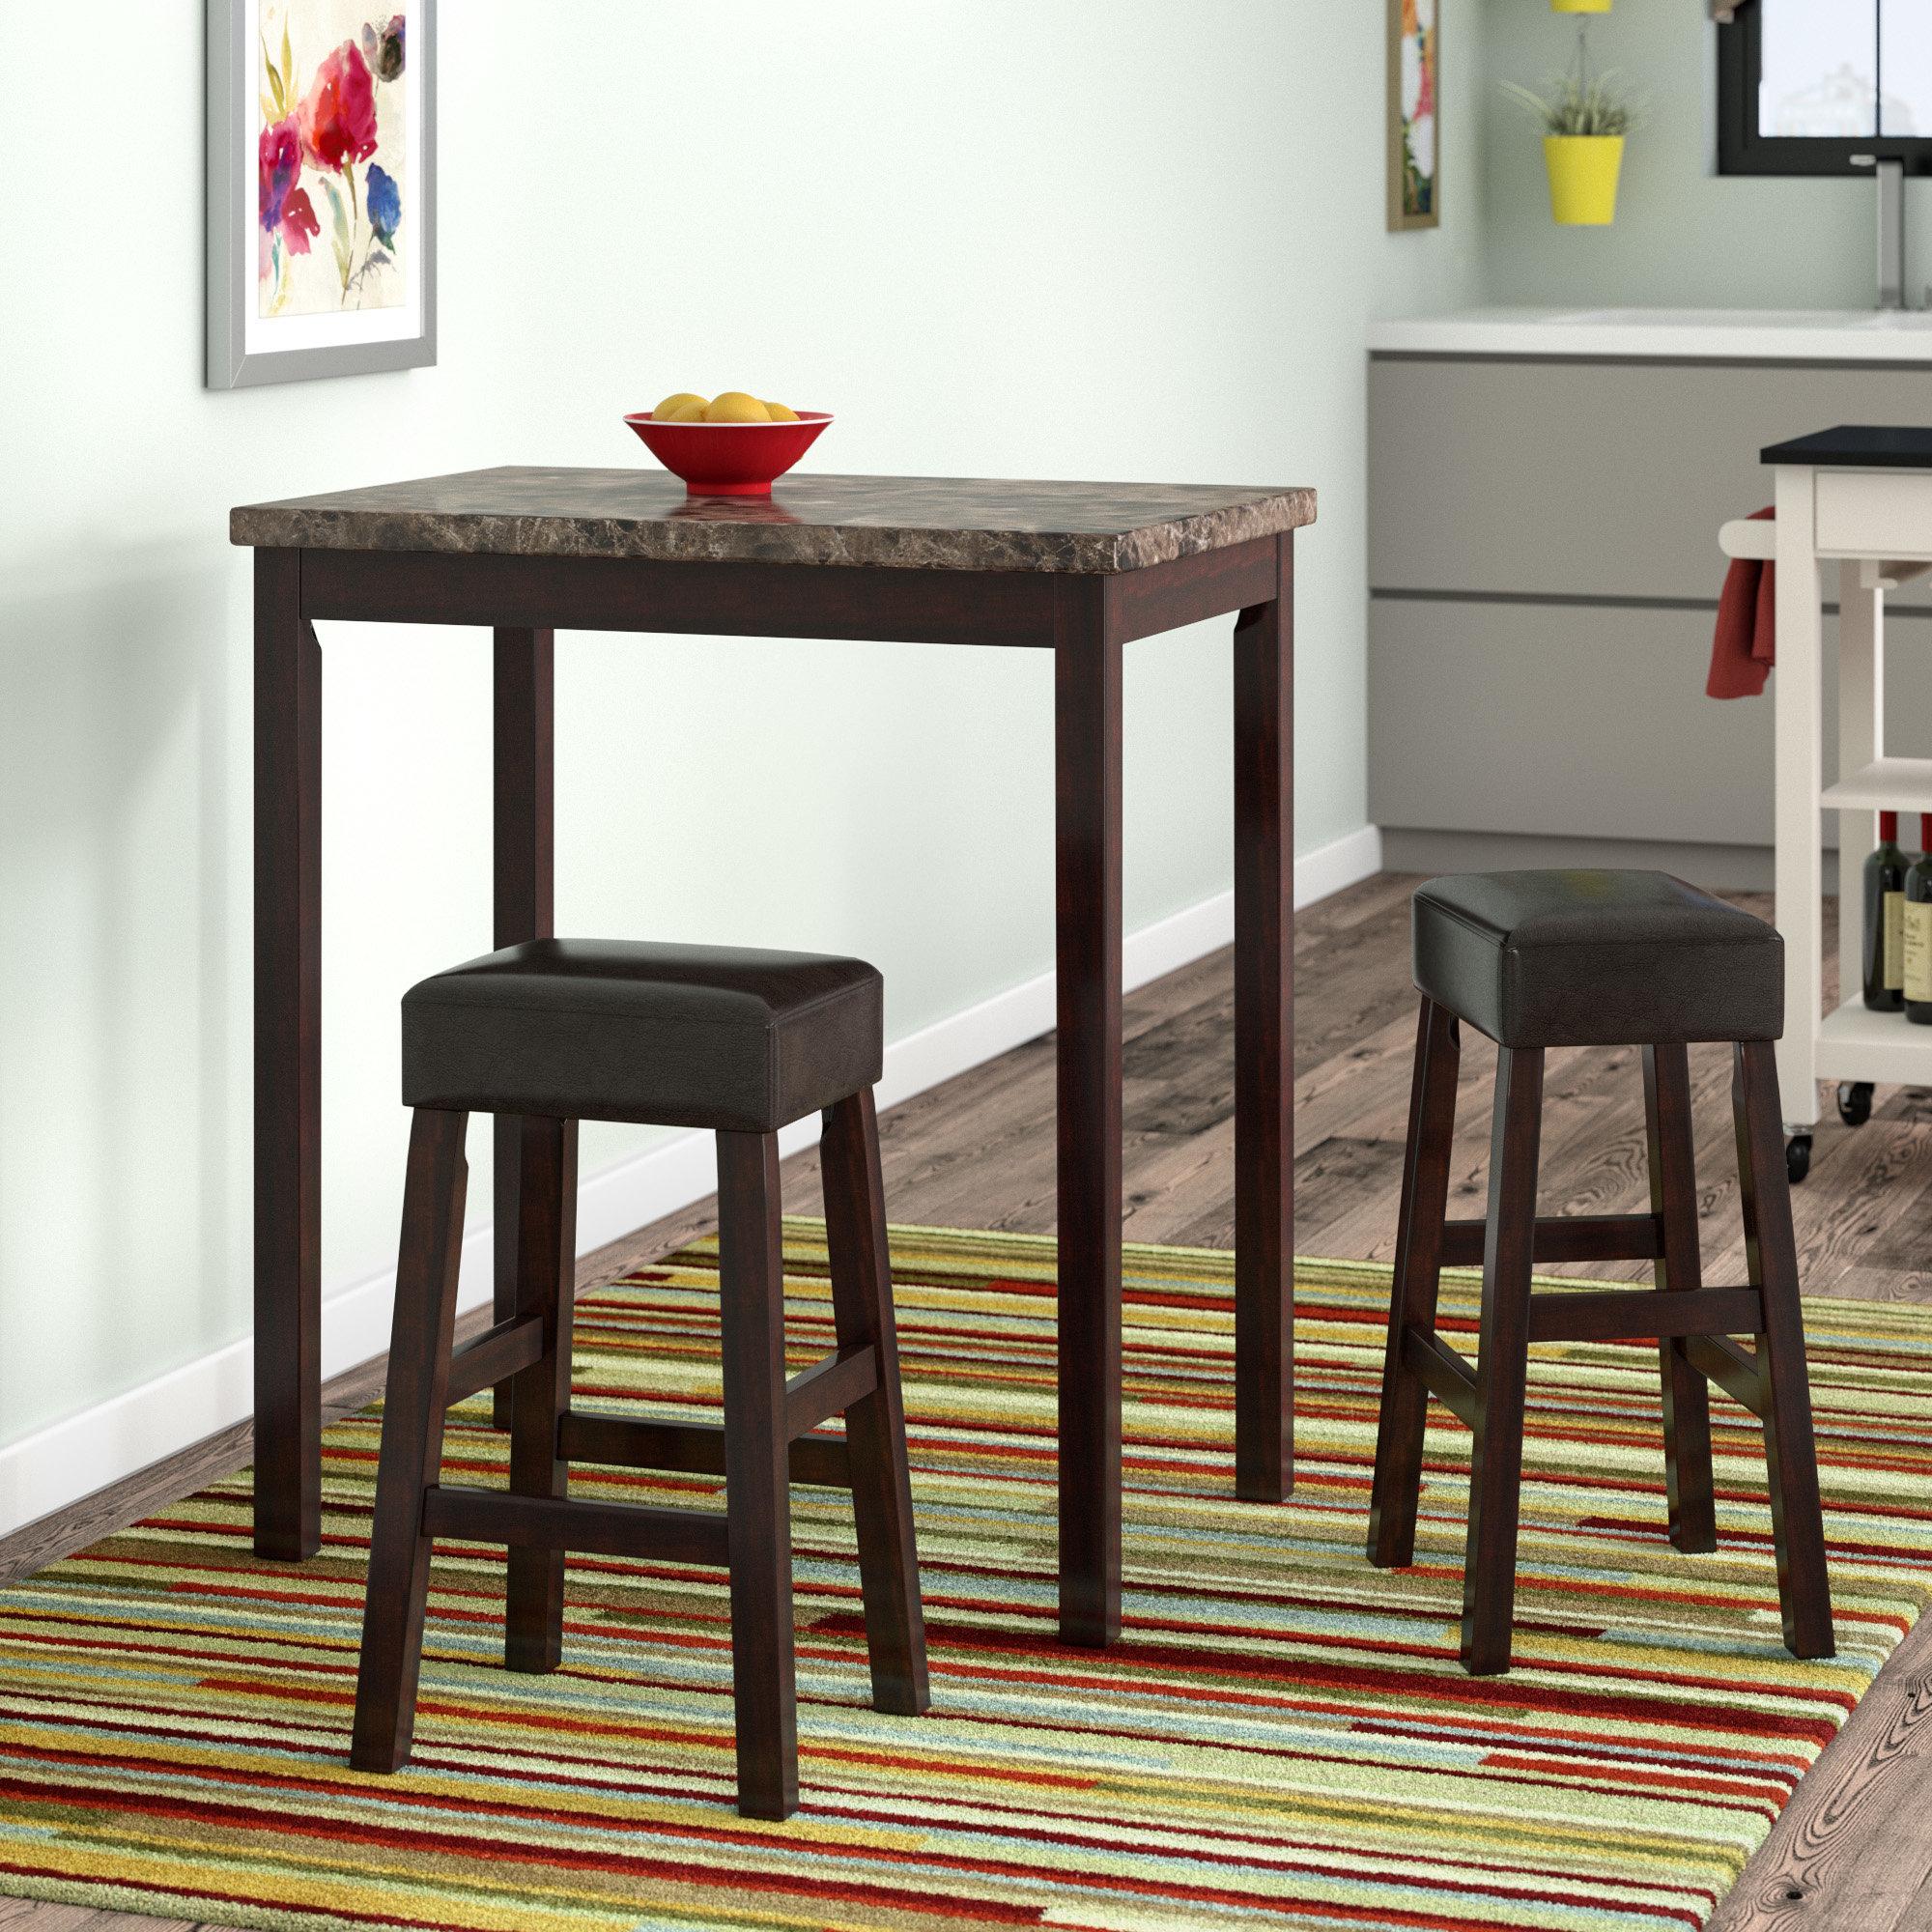 Latitude Run Deitch 3 Piece Counter Height Dining Set | Wayfair (View 20 of 20)